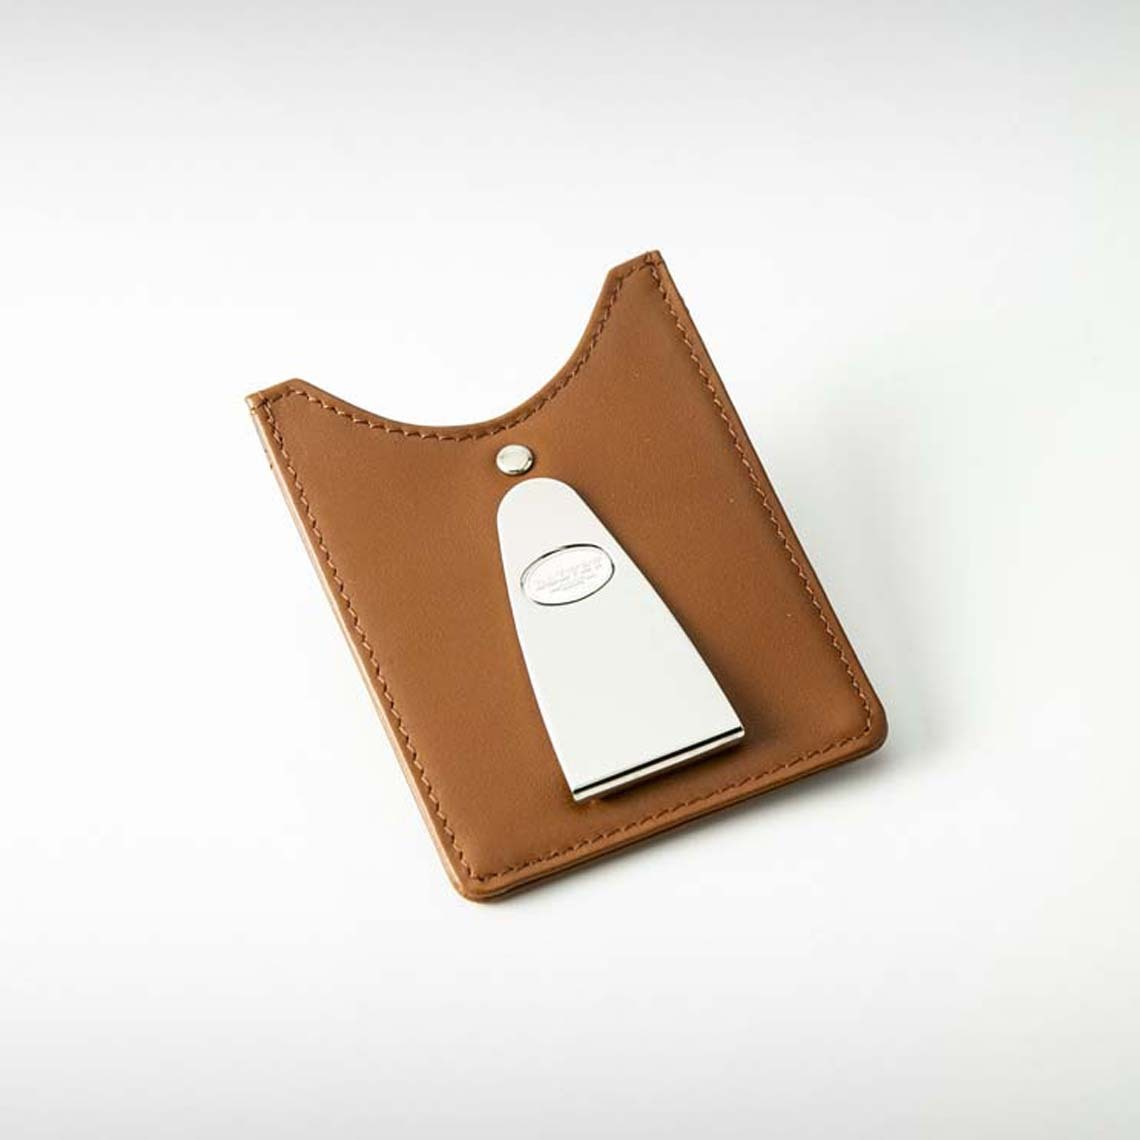 Dalvey Brown Money Clip & Card Holder